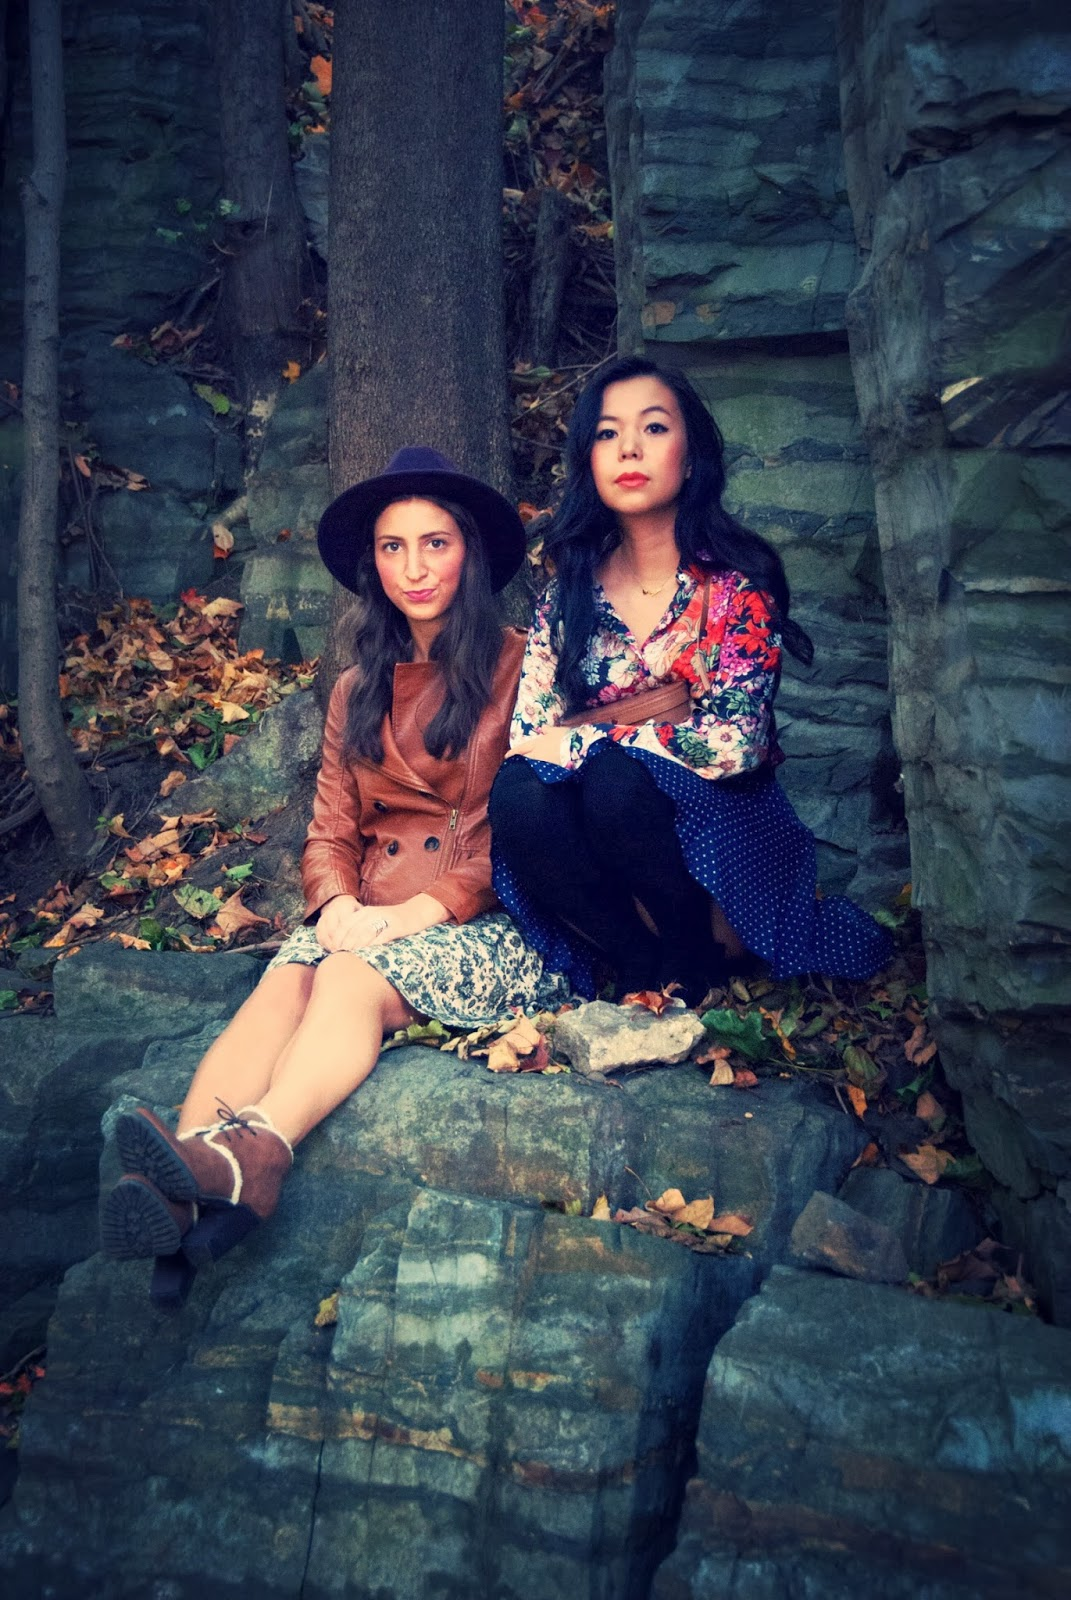 Montreal rocks cliff floral blouse camel leather jacket polka dot skirt black socks booties